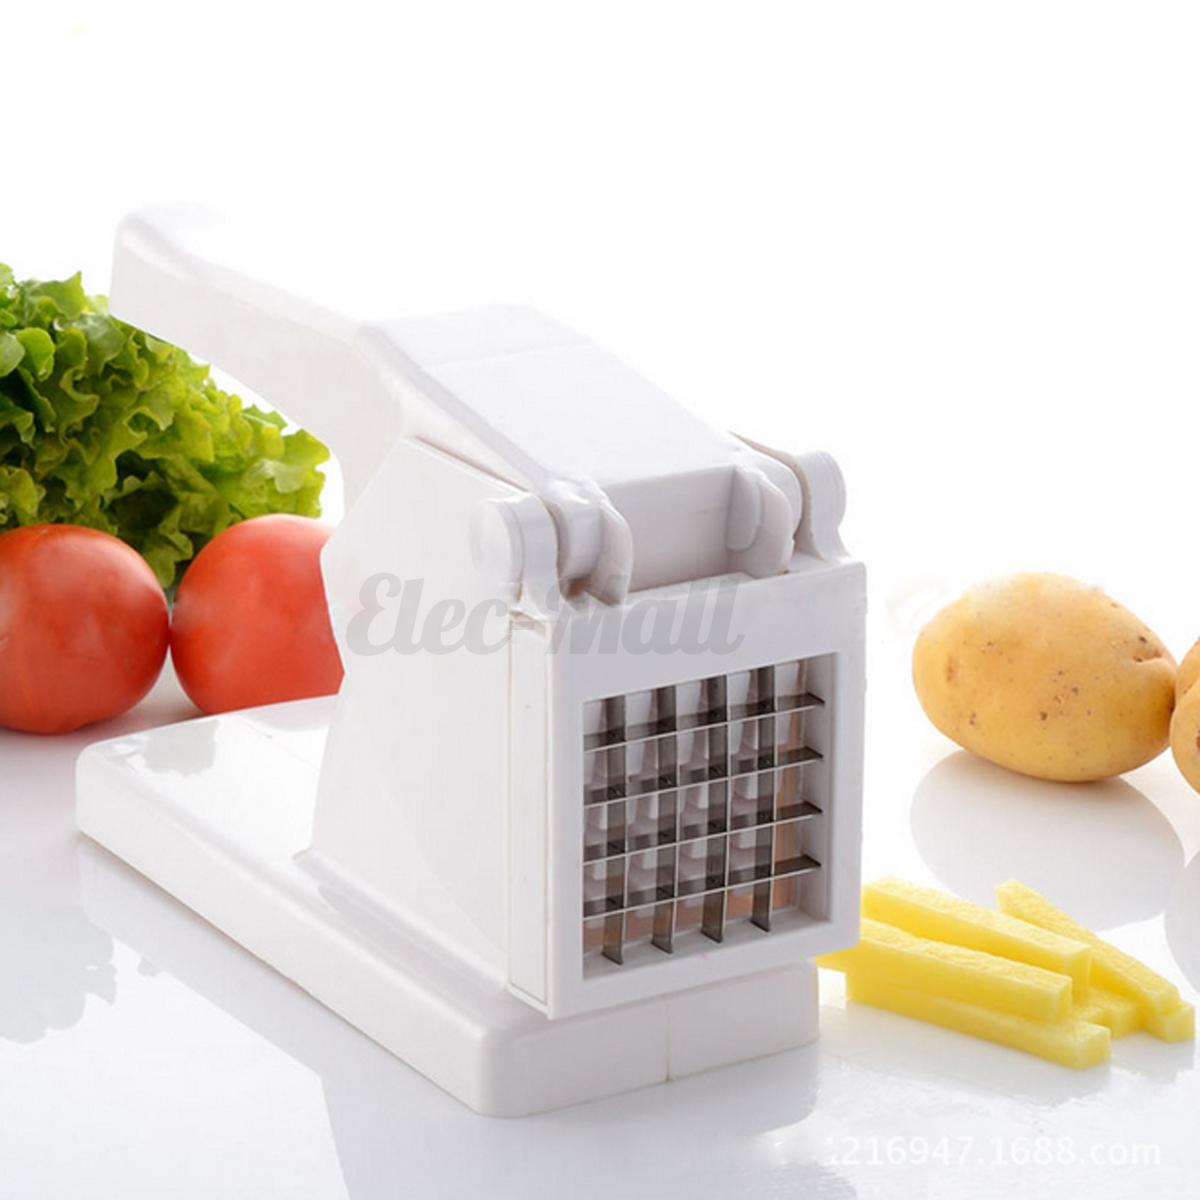 stainless steel french fry potato cutter maker slicer chopper dicer 2 blades - Vegetable Dicer